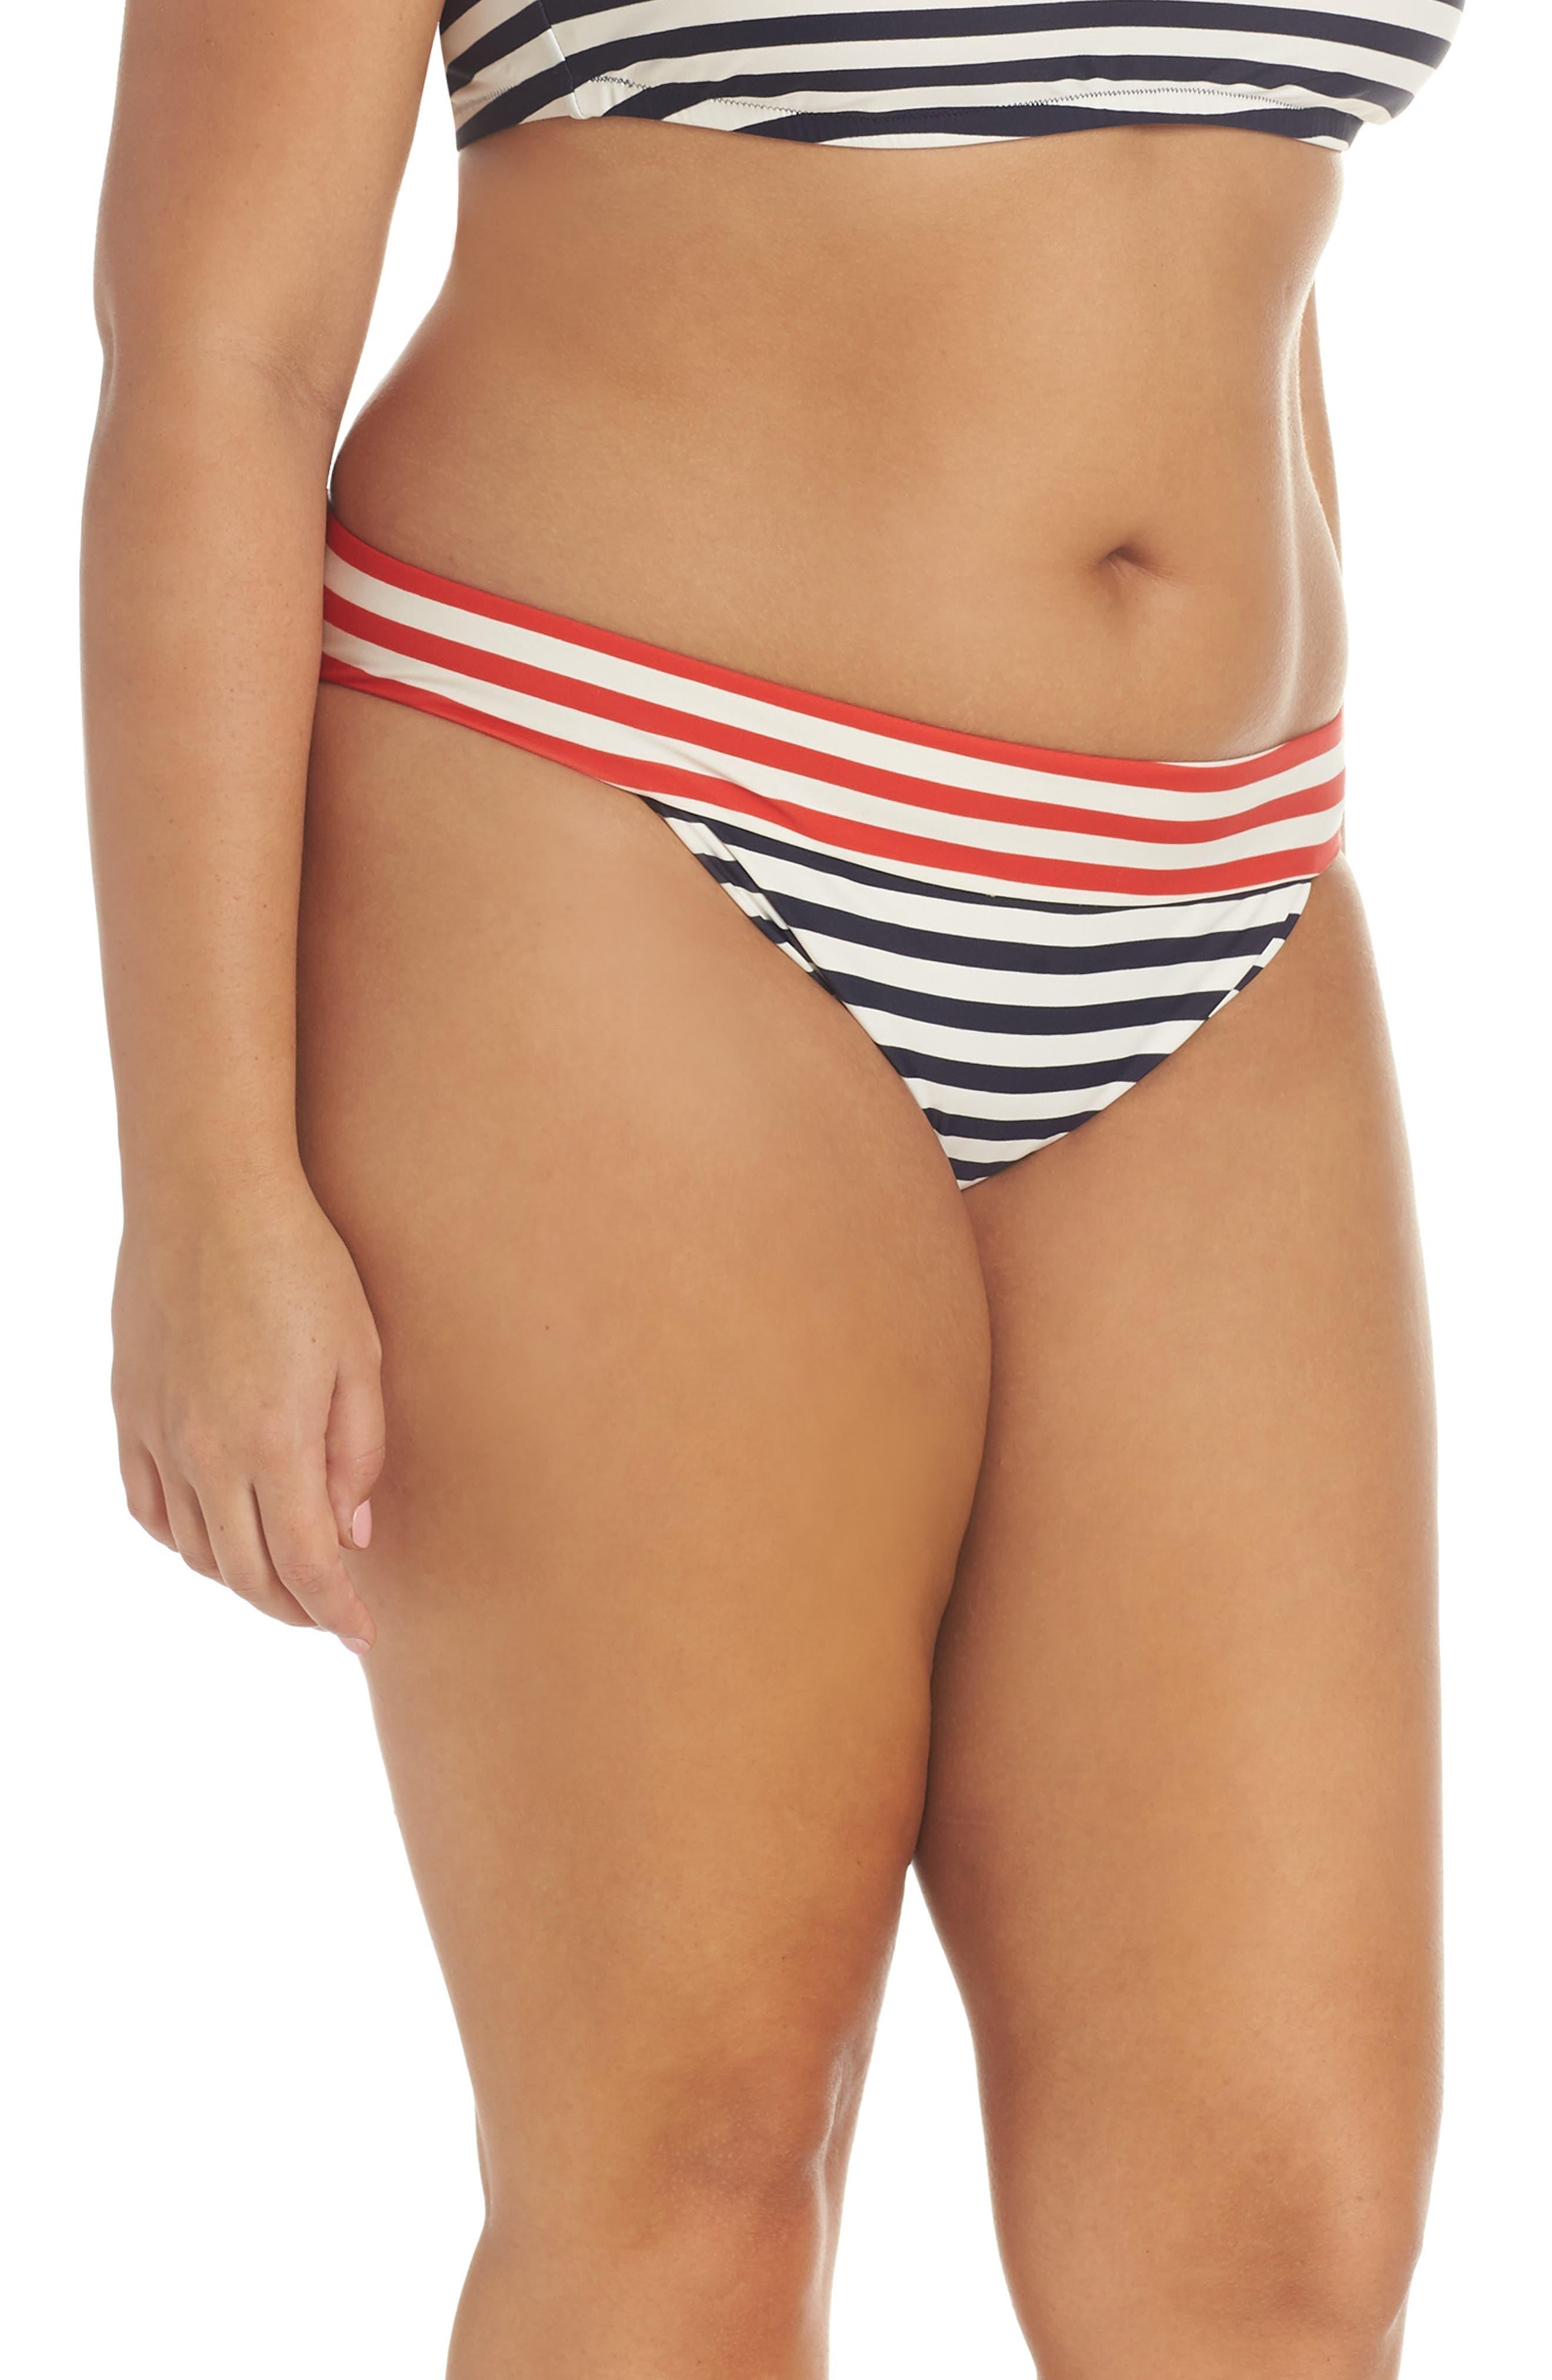 Stripe Banded Bikini Bottoms,                             Alternate thumbnail 3, color,                             400